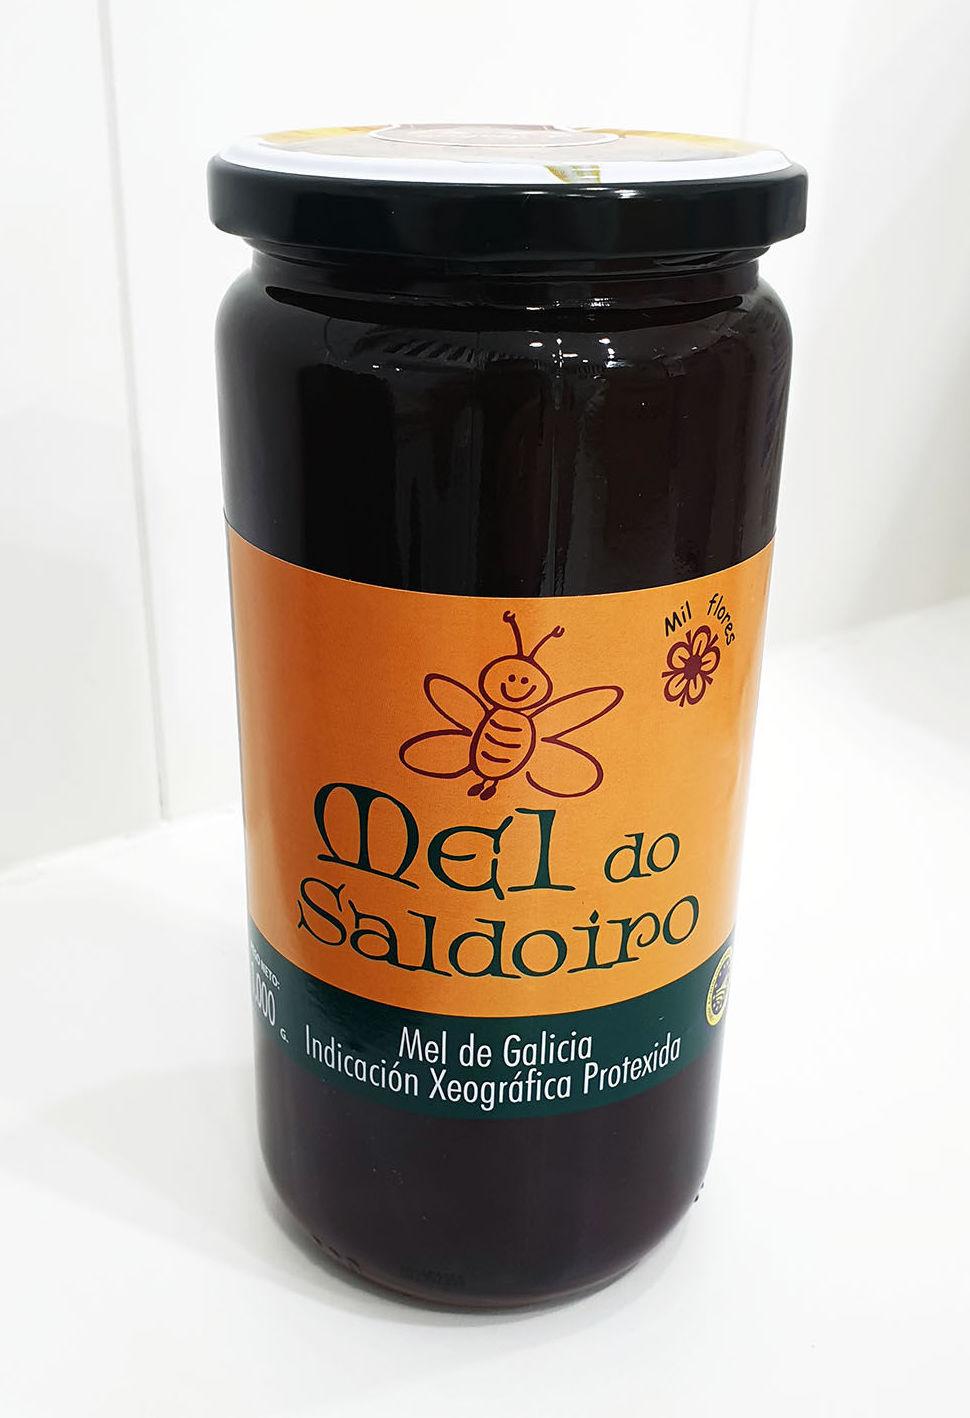 Miel gallega de primera calidad (1kg)